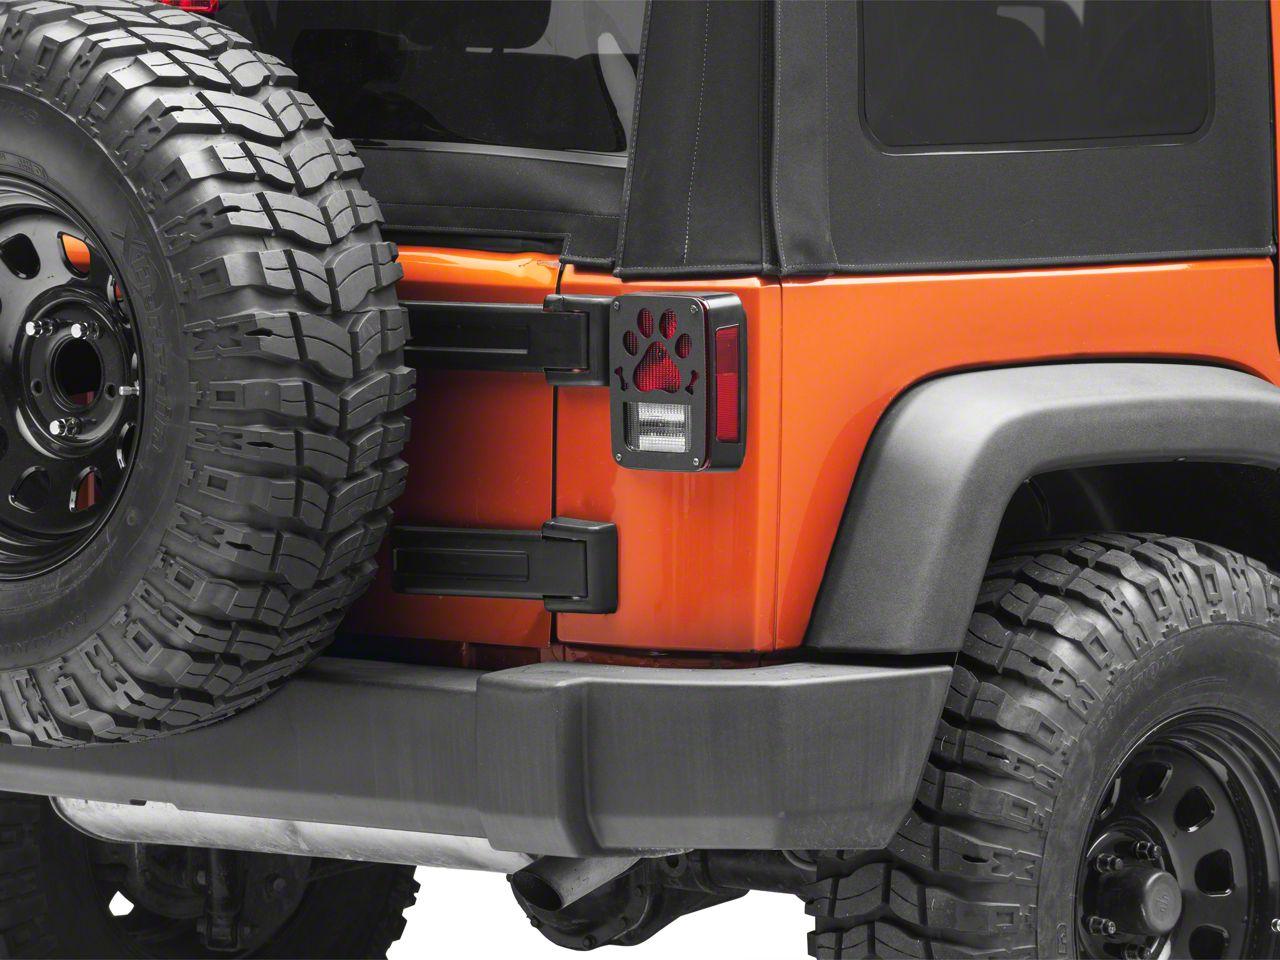 Jeep Tweaks Tail Light Guards - Paws & Bones Design (07-18 Jeep Wrangler JK)